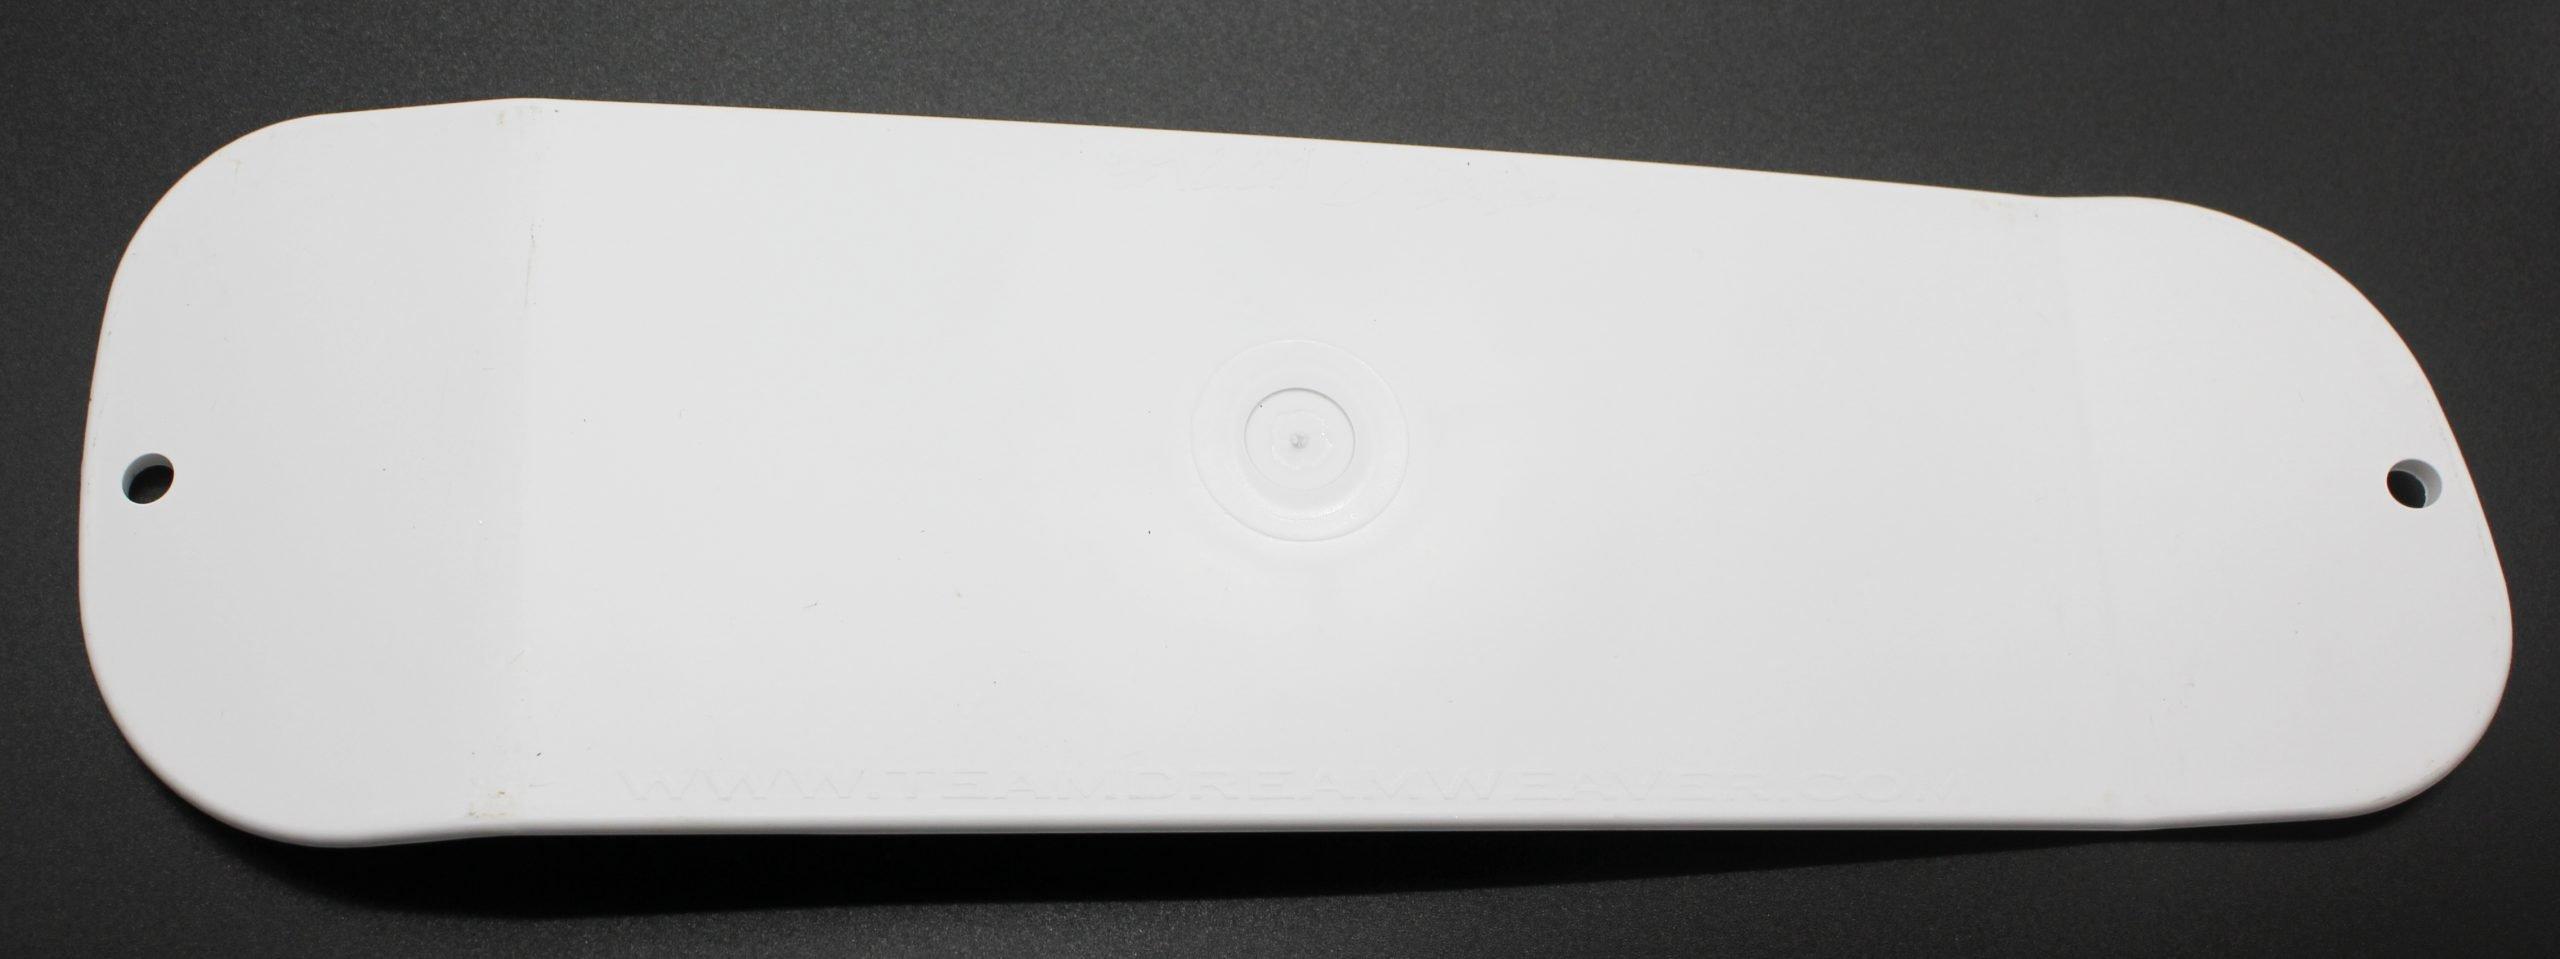 Paddle 11 – White/Chrome